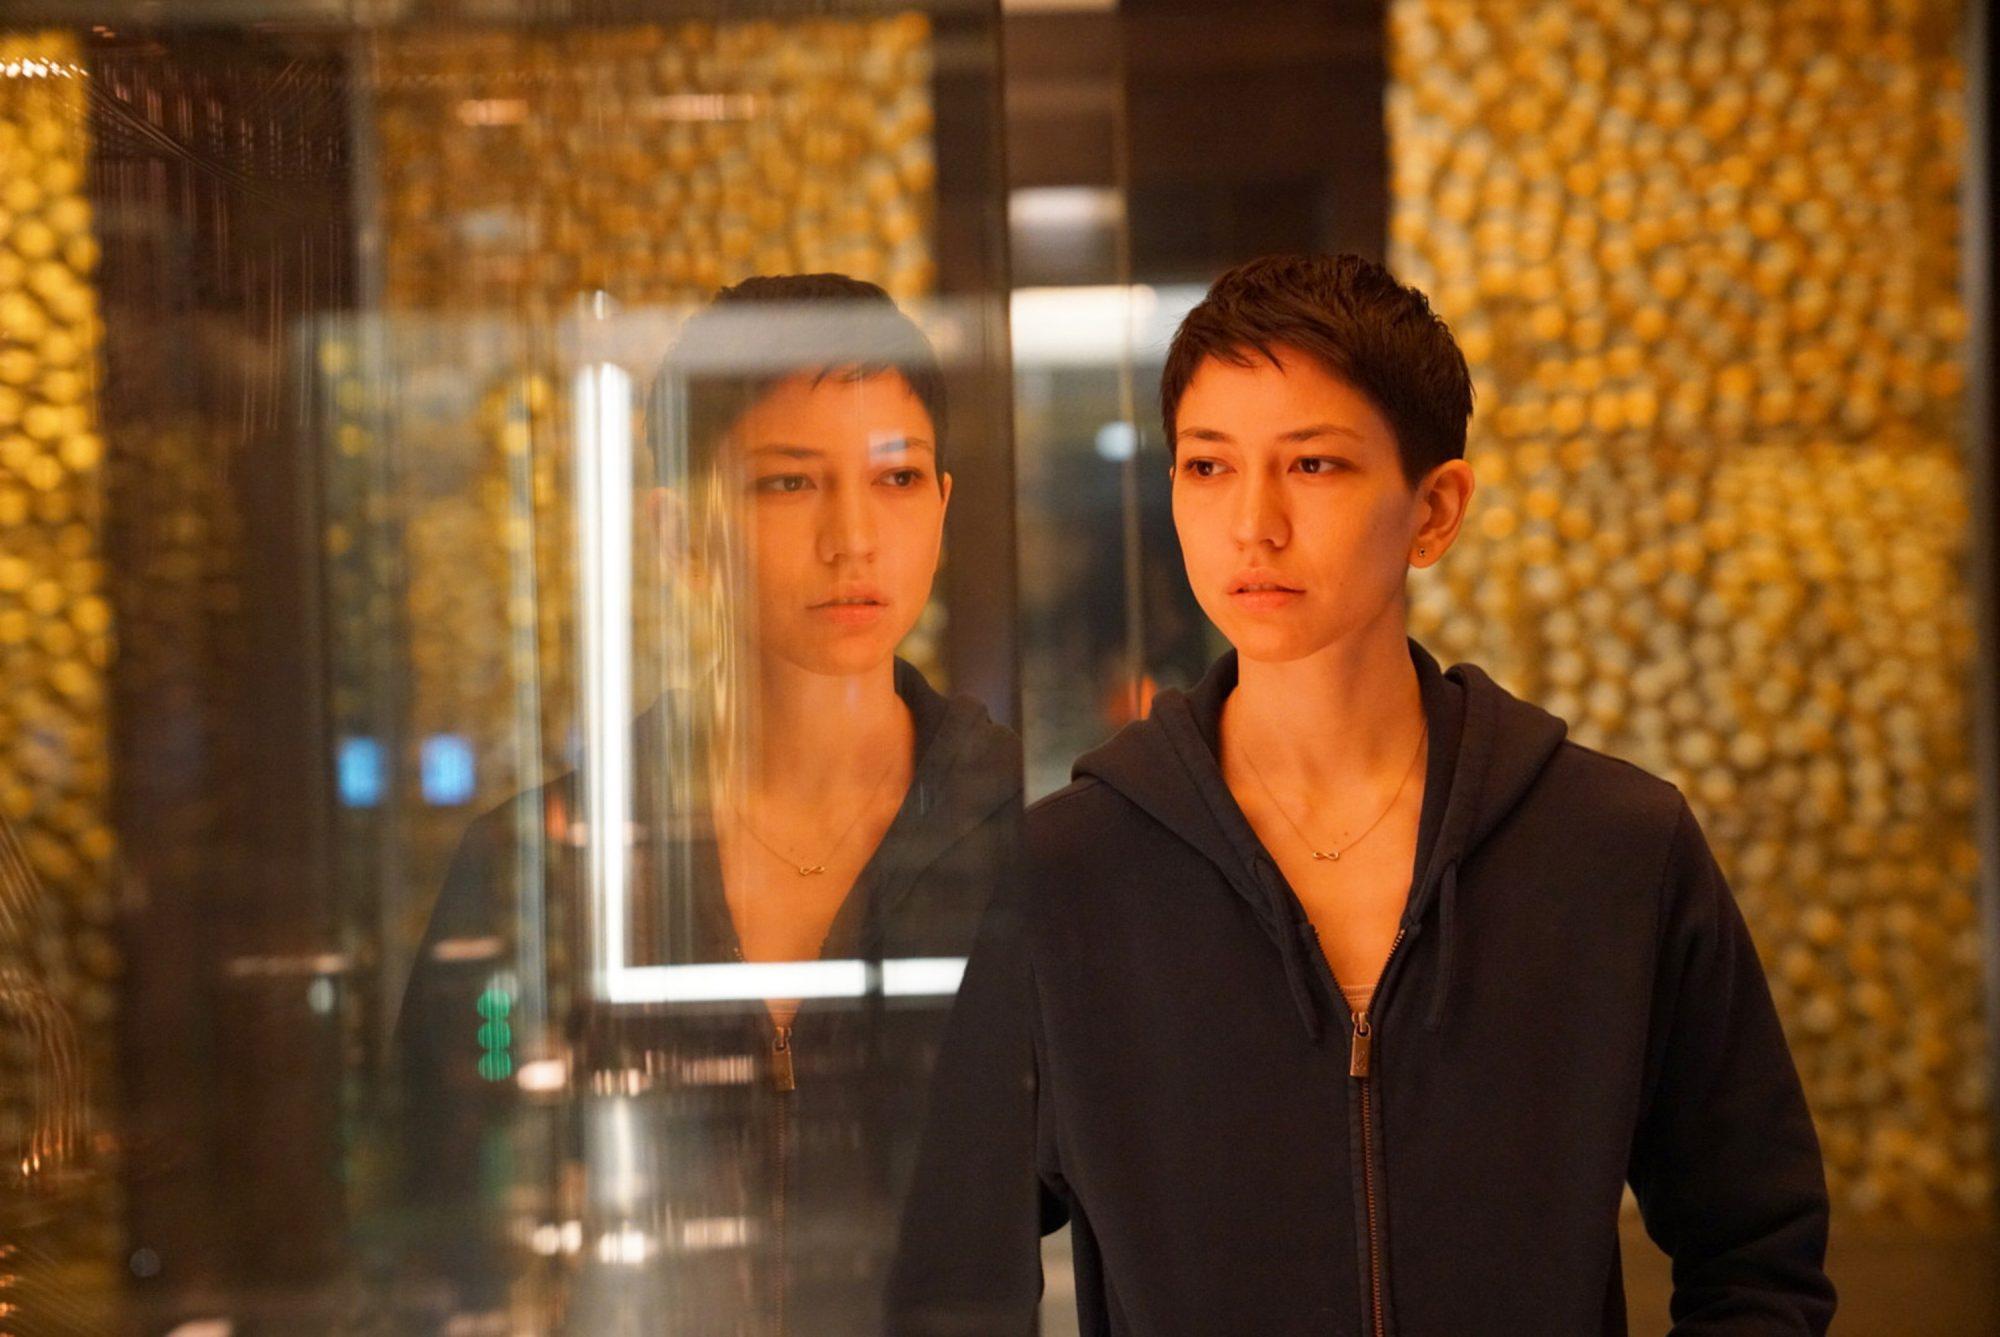 Sonoya Mizuno as Lily Chan in DEVS